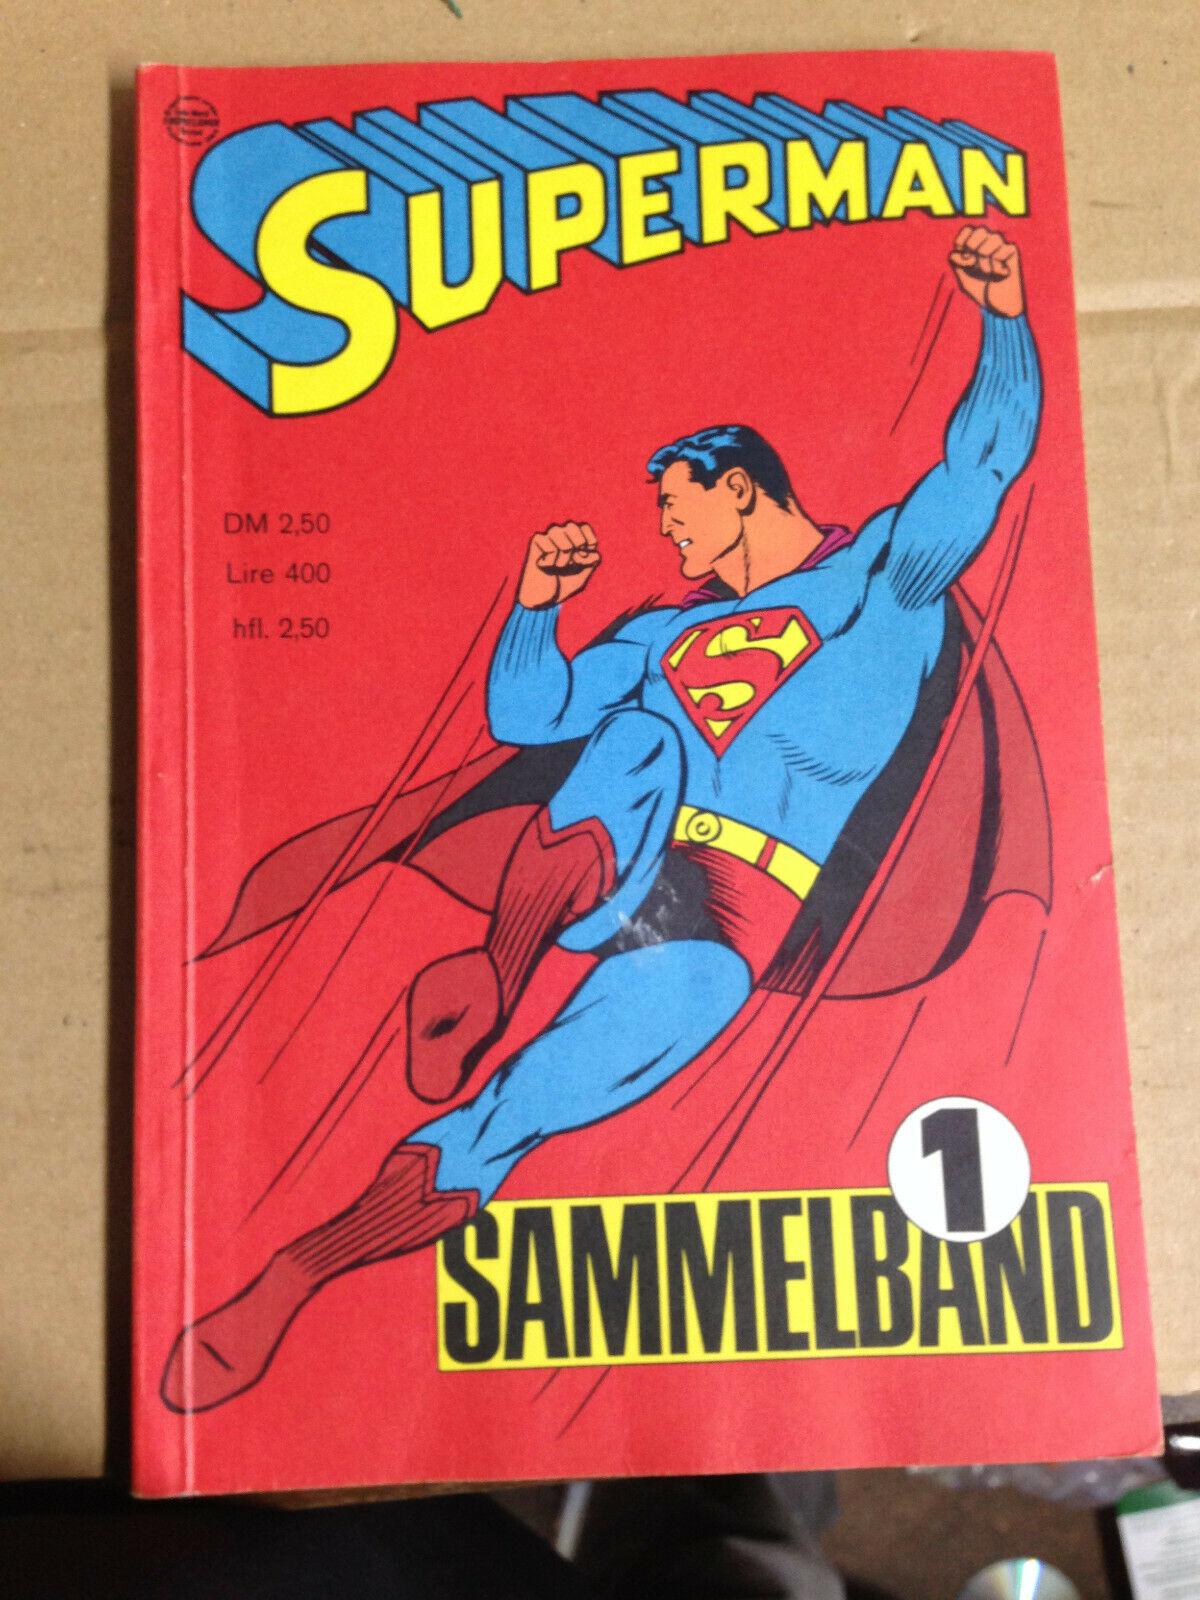 Superman Sammelband Nr. 1  von 1966 Ehapa Verlag